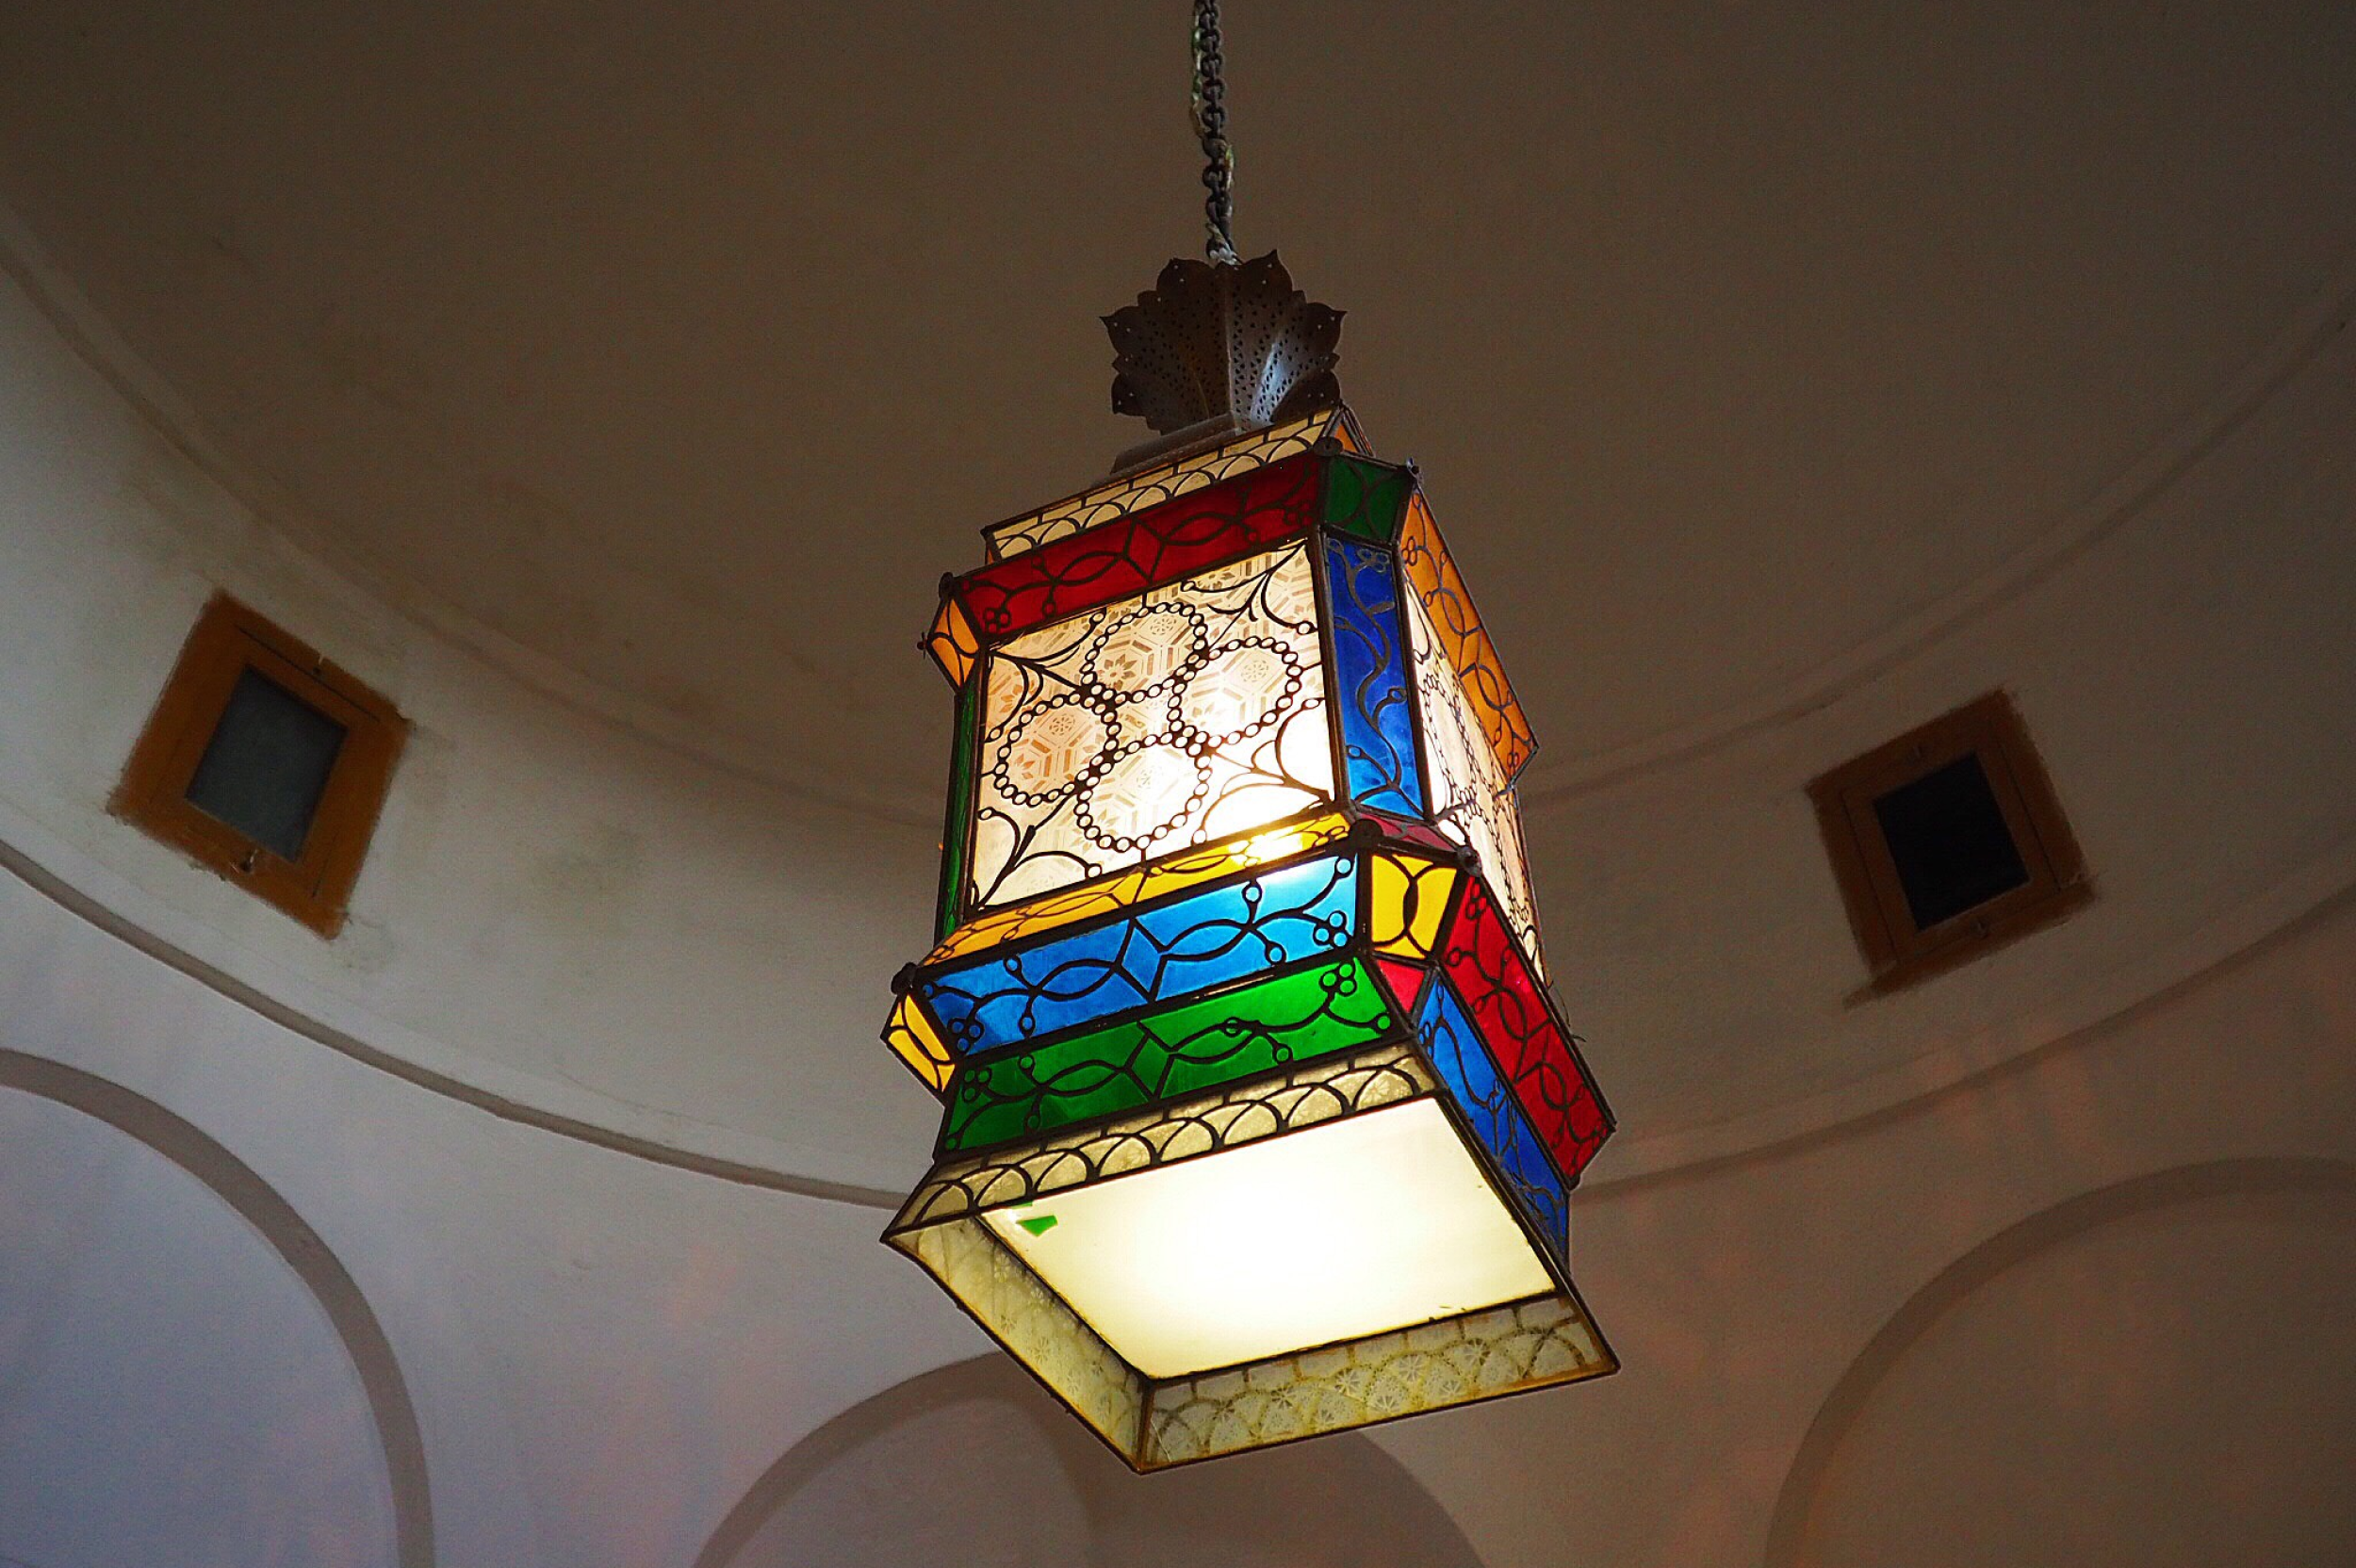 La_lampe